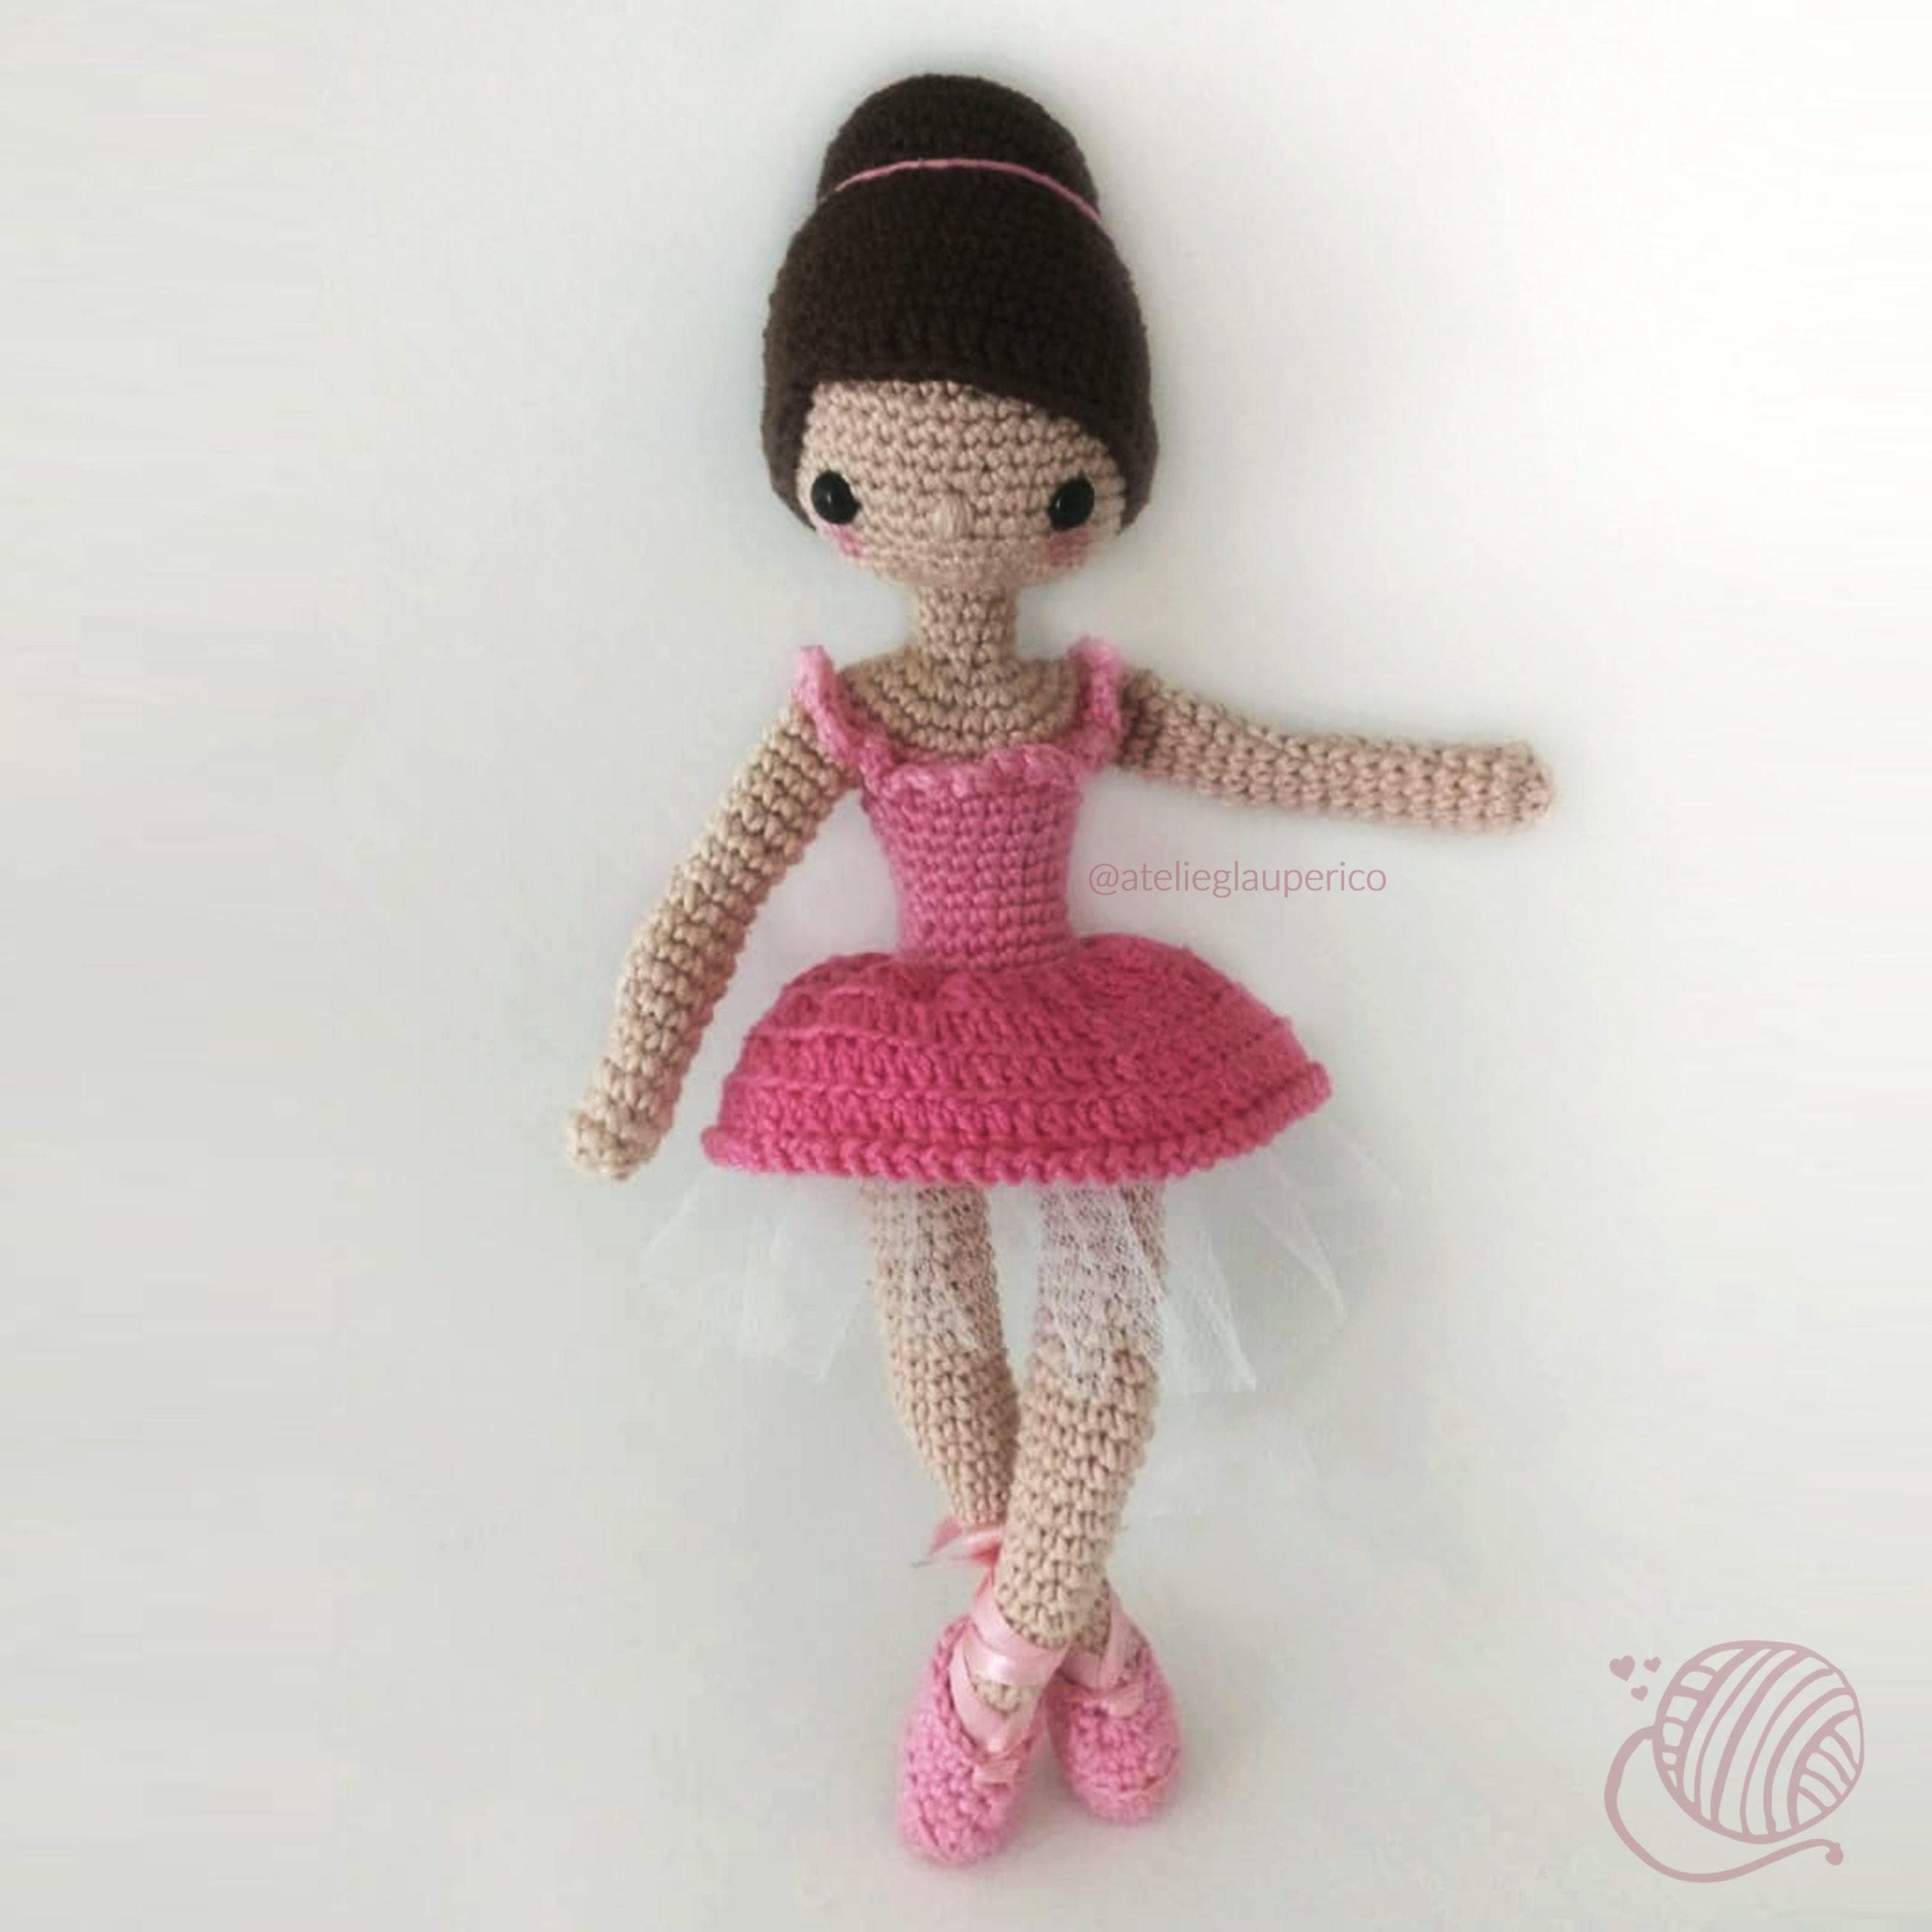 Leve Junto! 4 Kits Amigurumi Coleção Bailarinas - Círculo - R$ 135 ... | 2560x2560